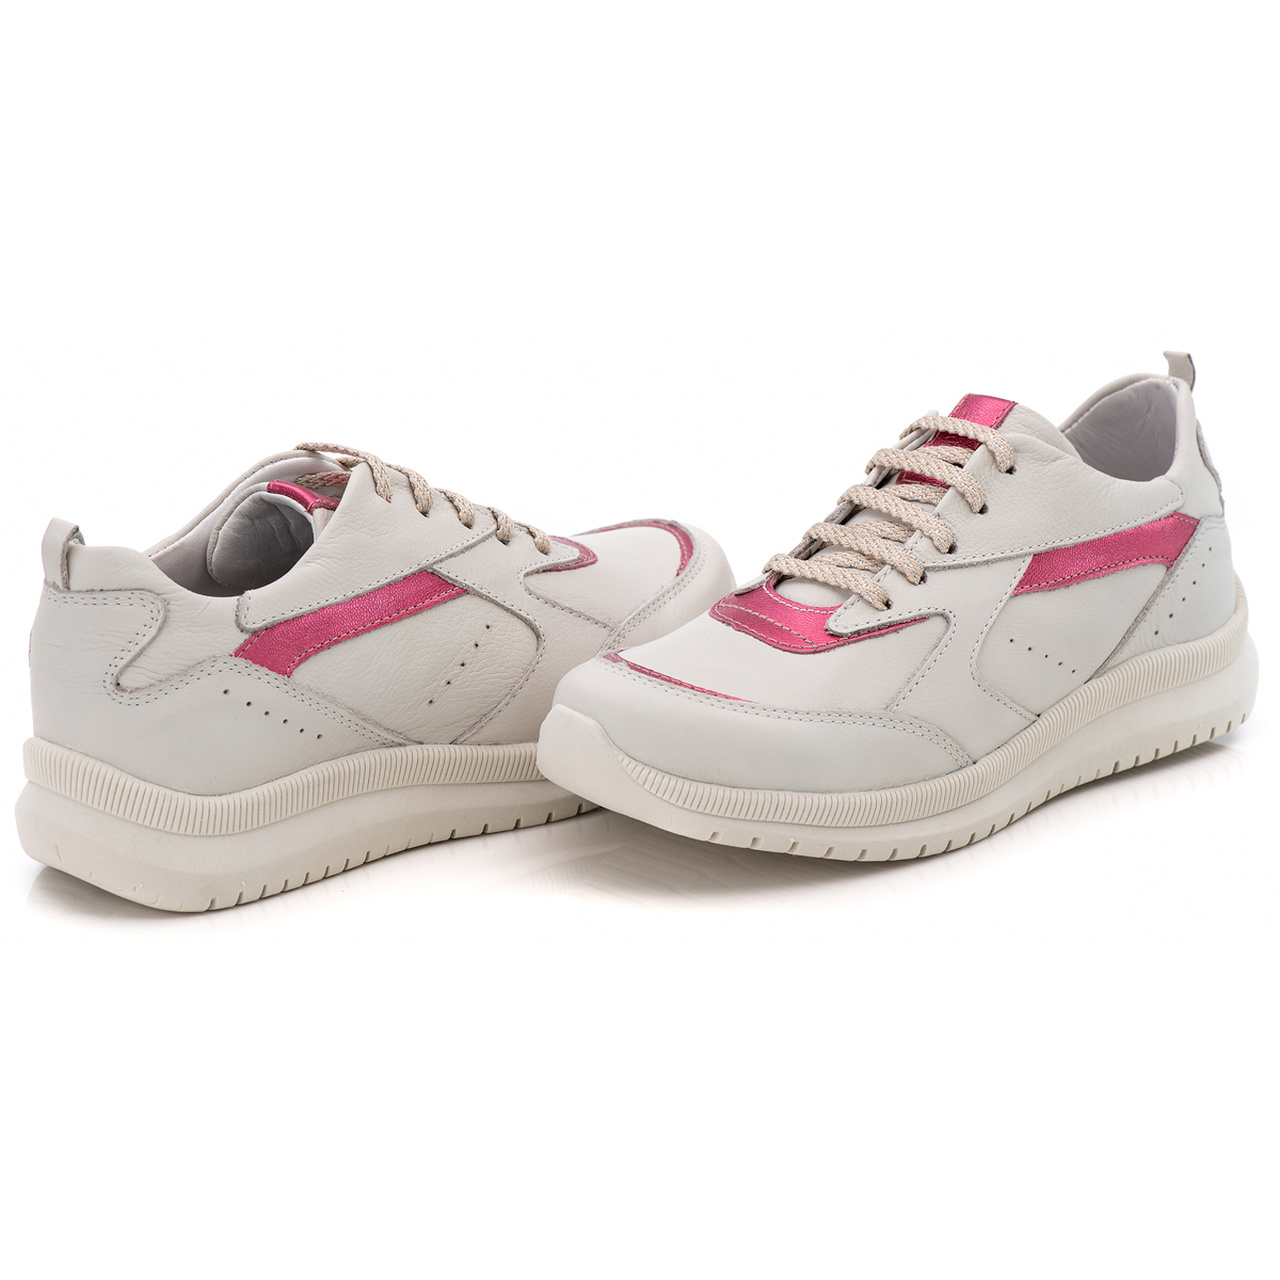 Tenis Feminino Modelo TF - 210 Gelo - Pink